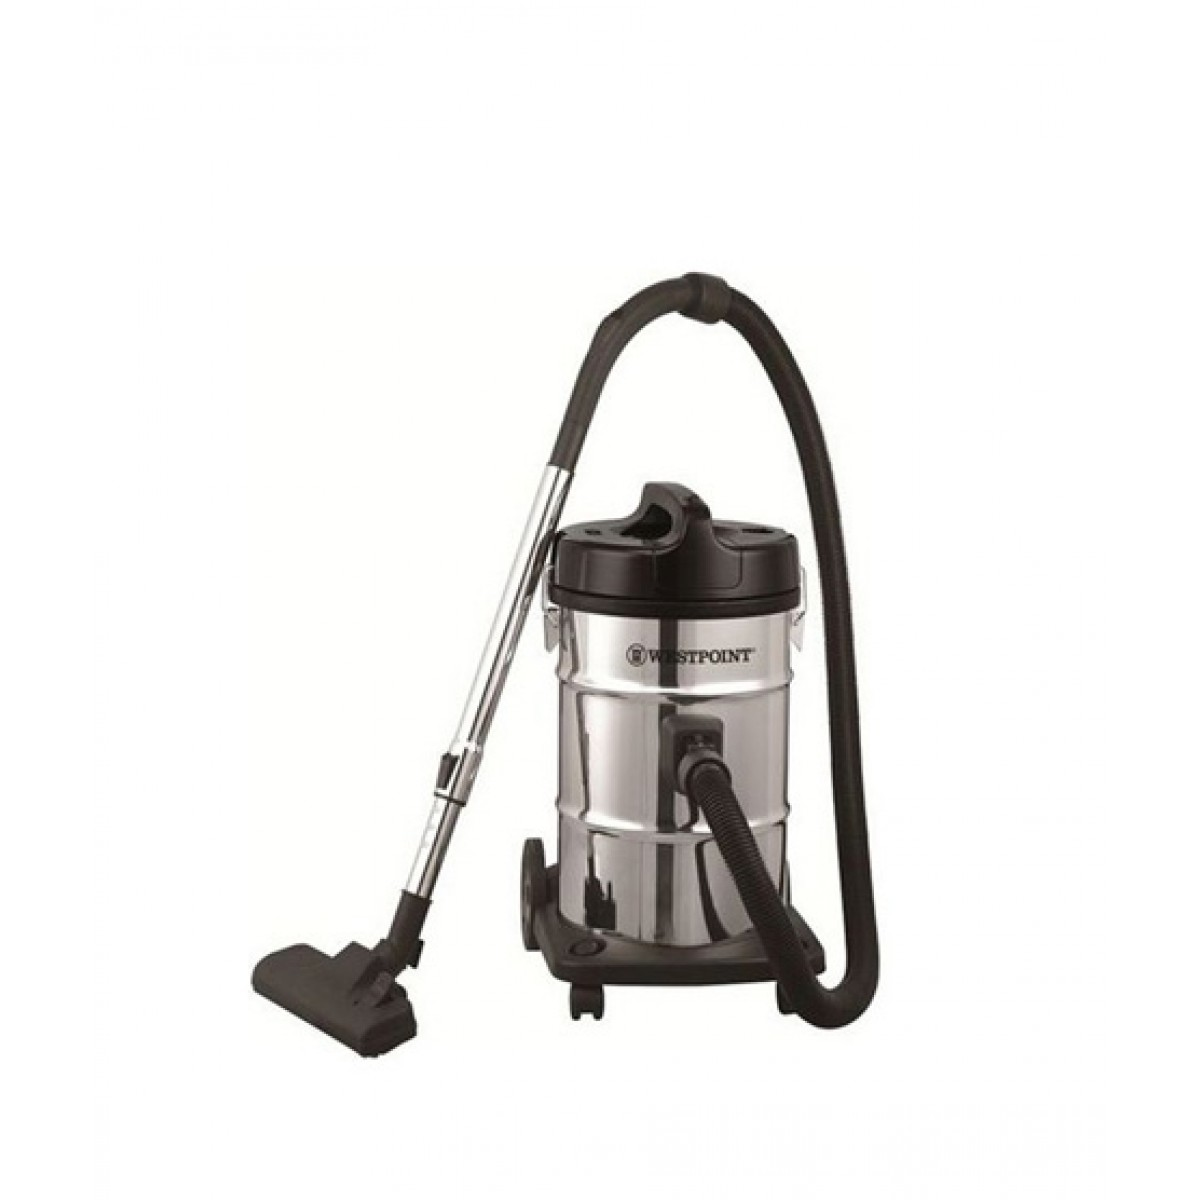 Image result for WestPoint Vacuum Cleaner WF-970